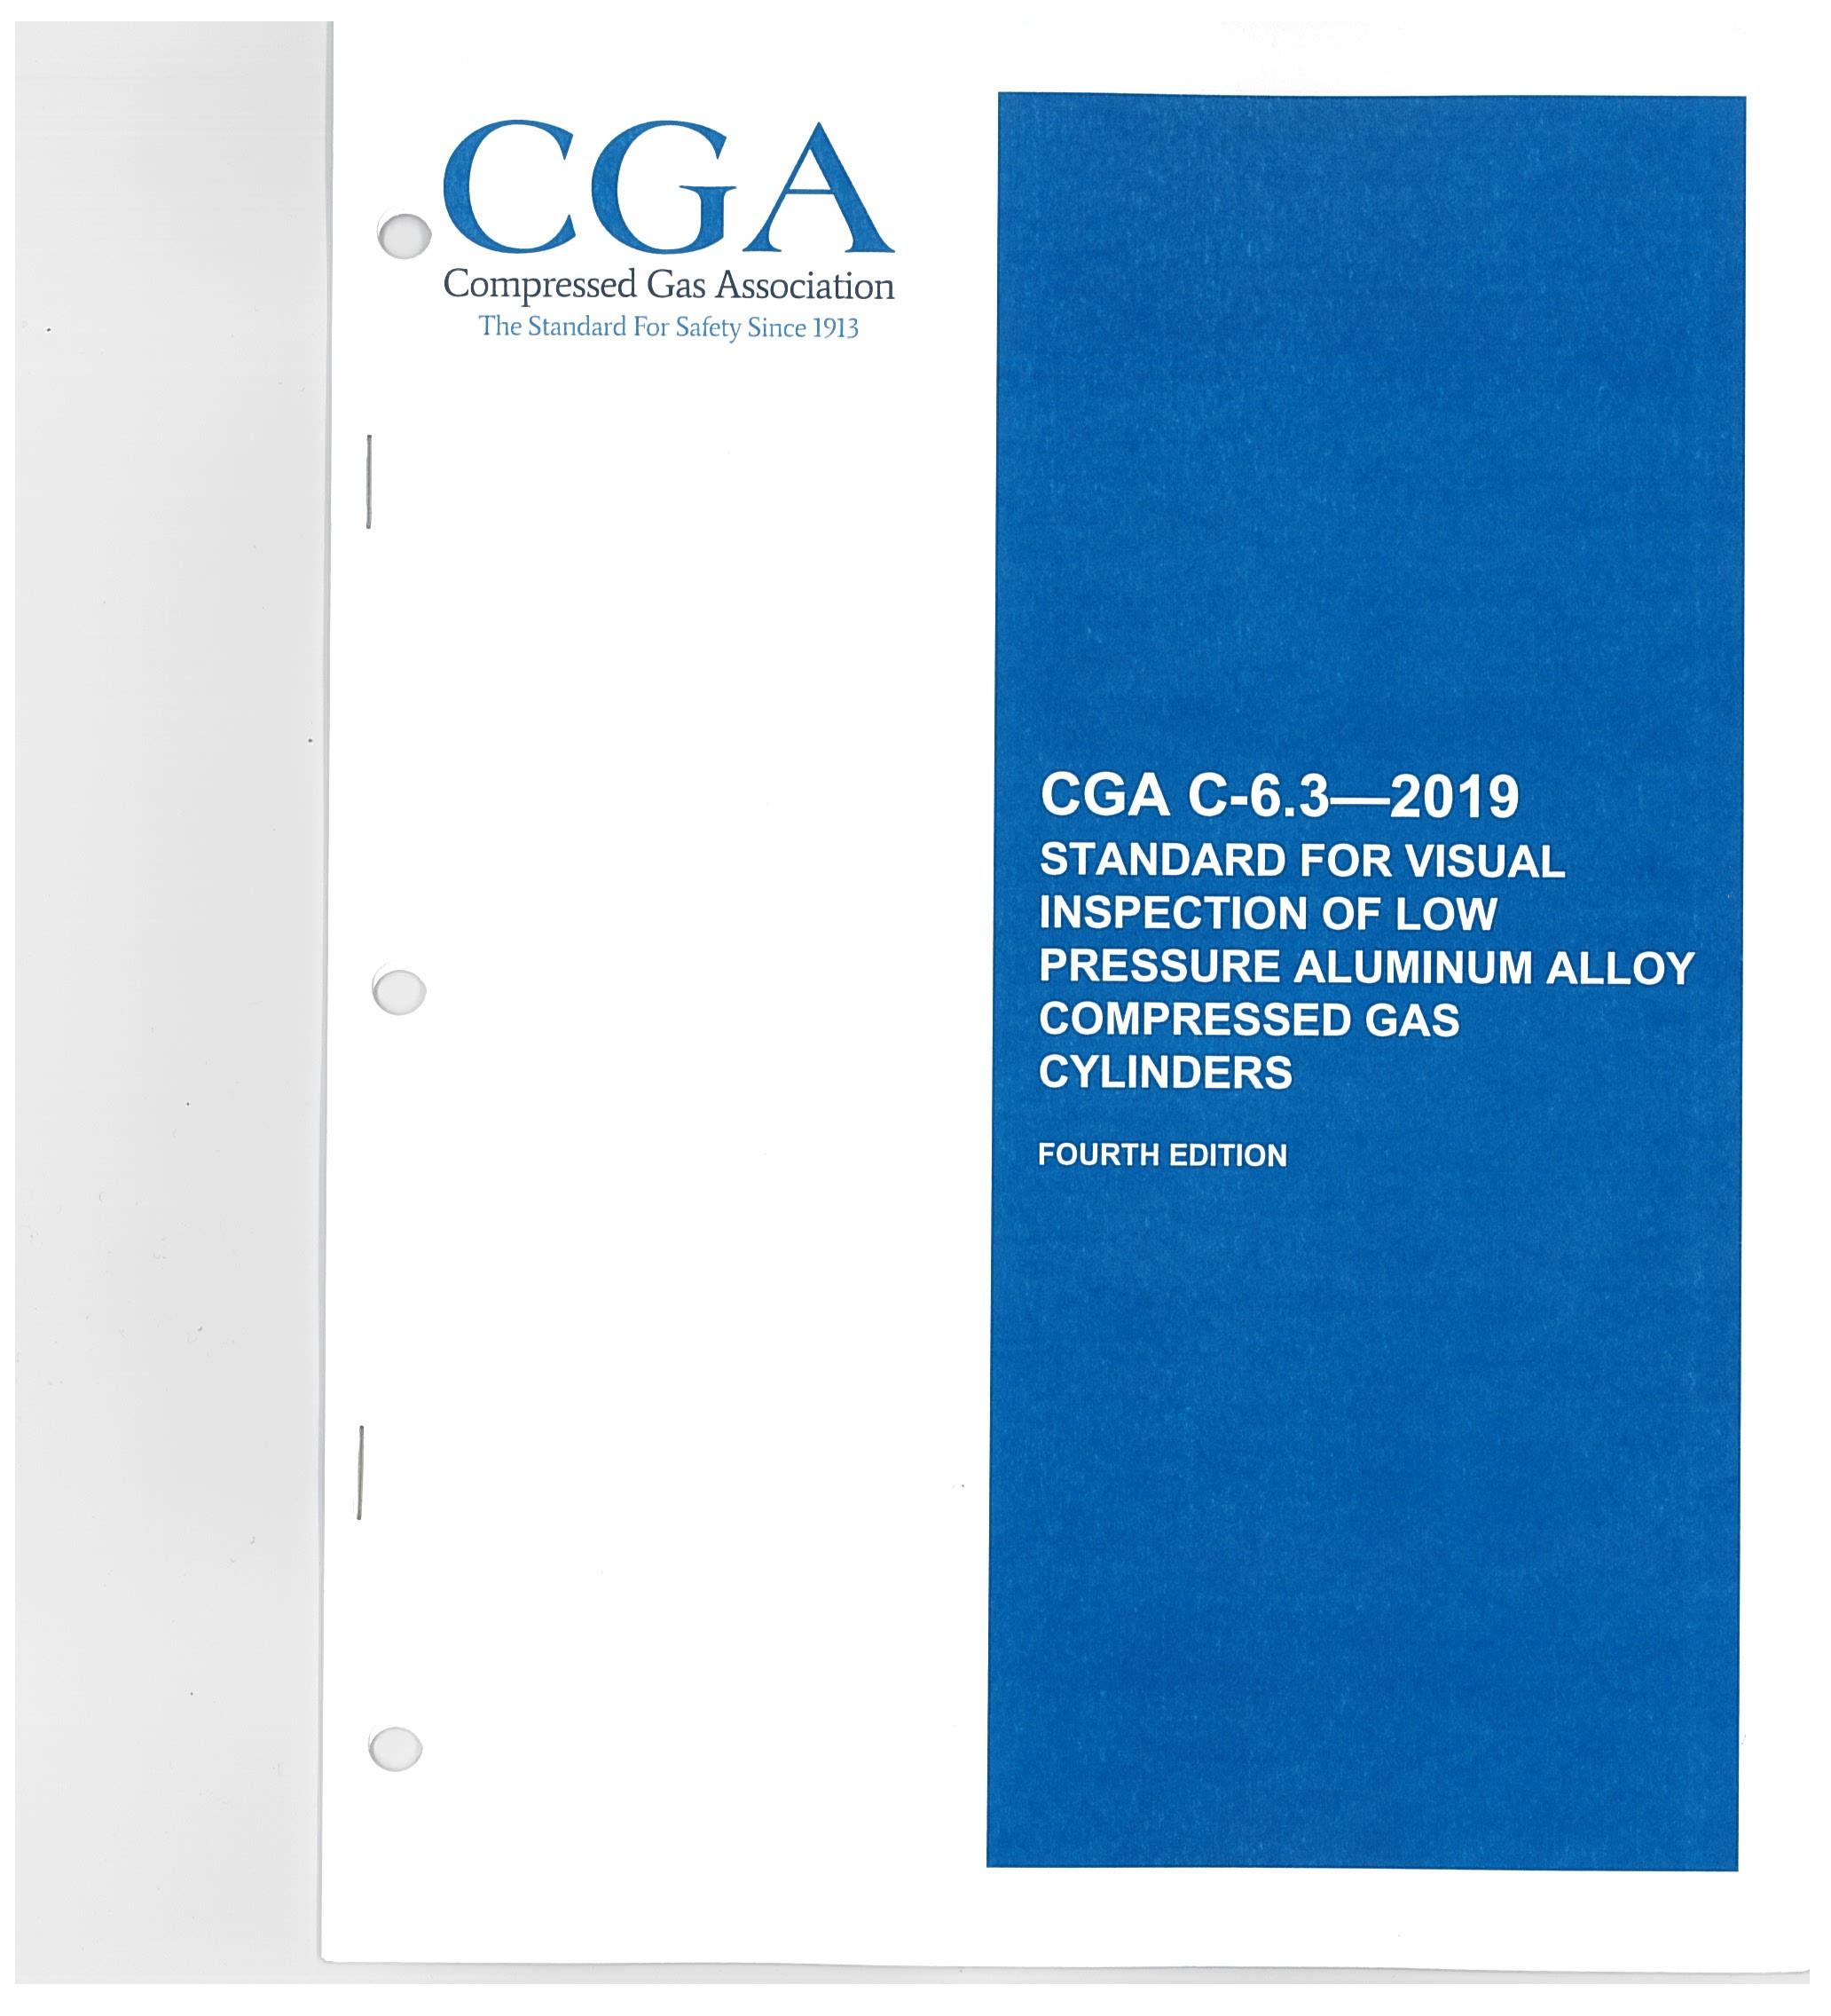 #393-306-3: CGA PAMPHLET C-6.3